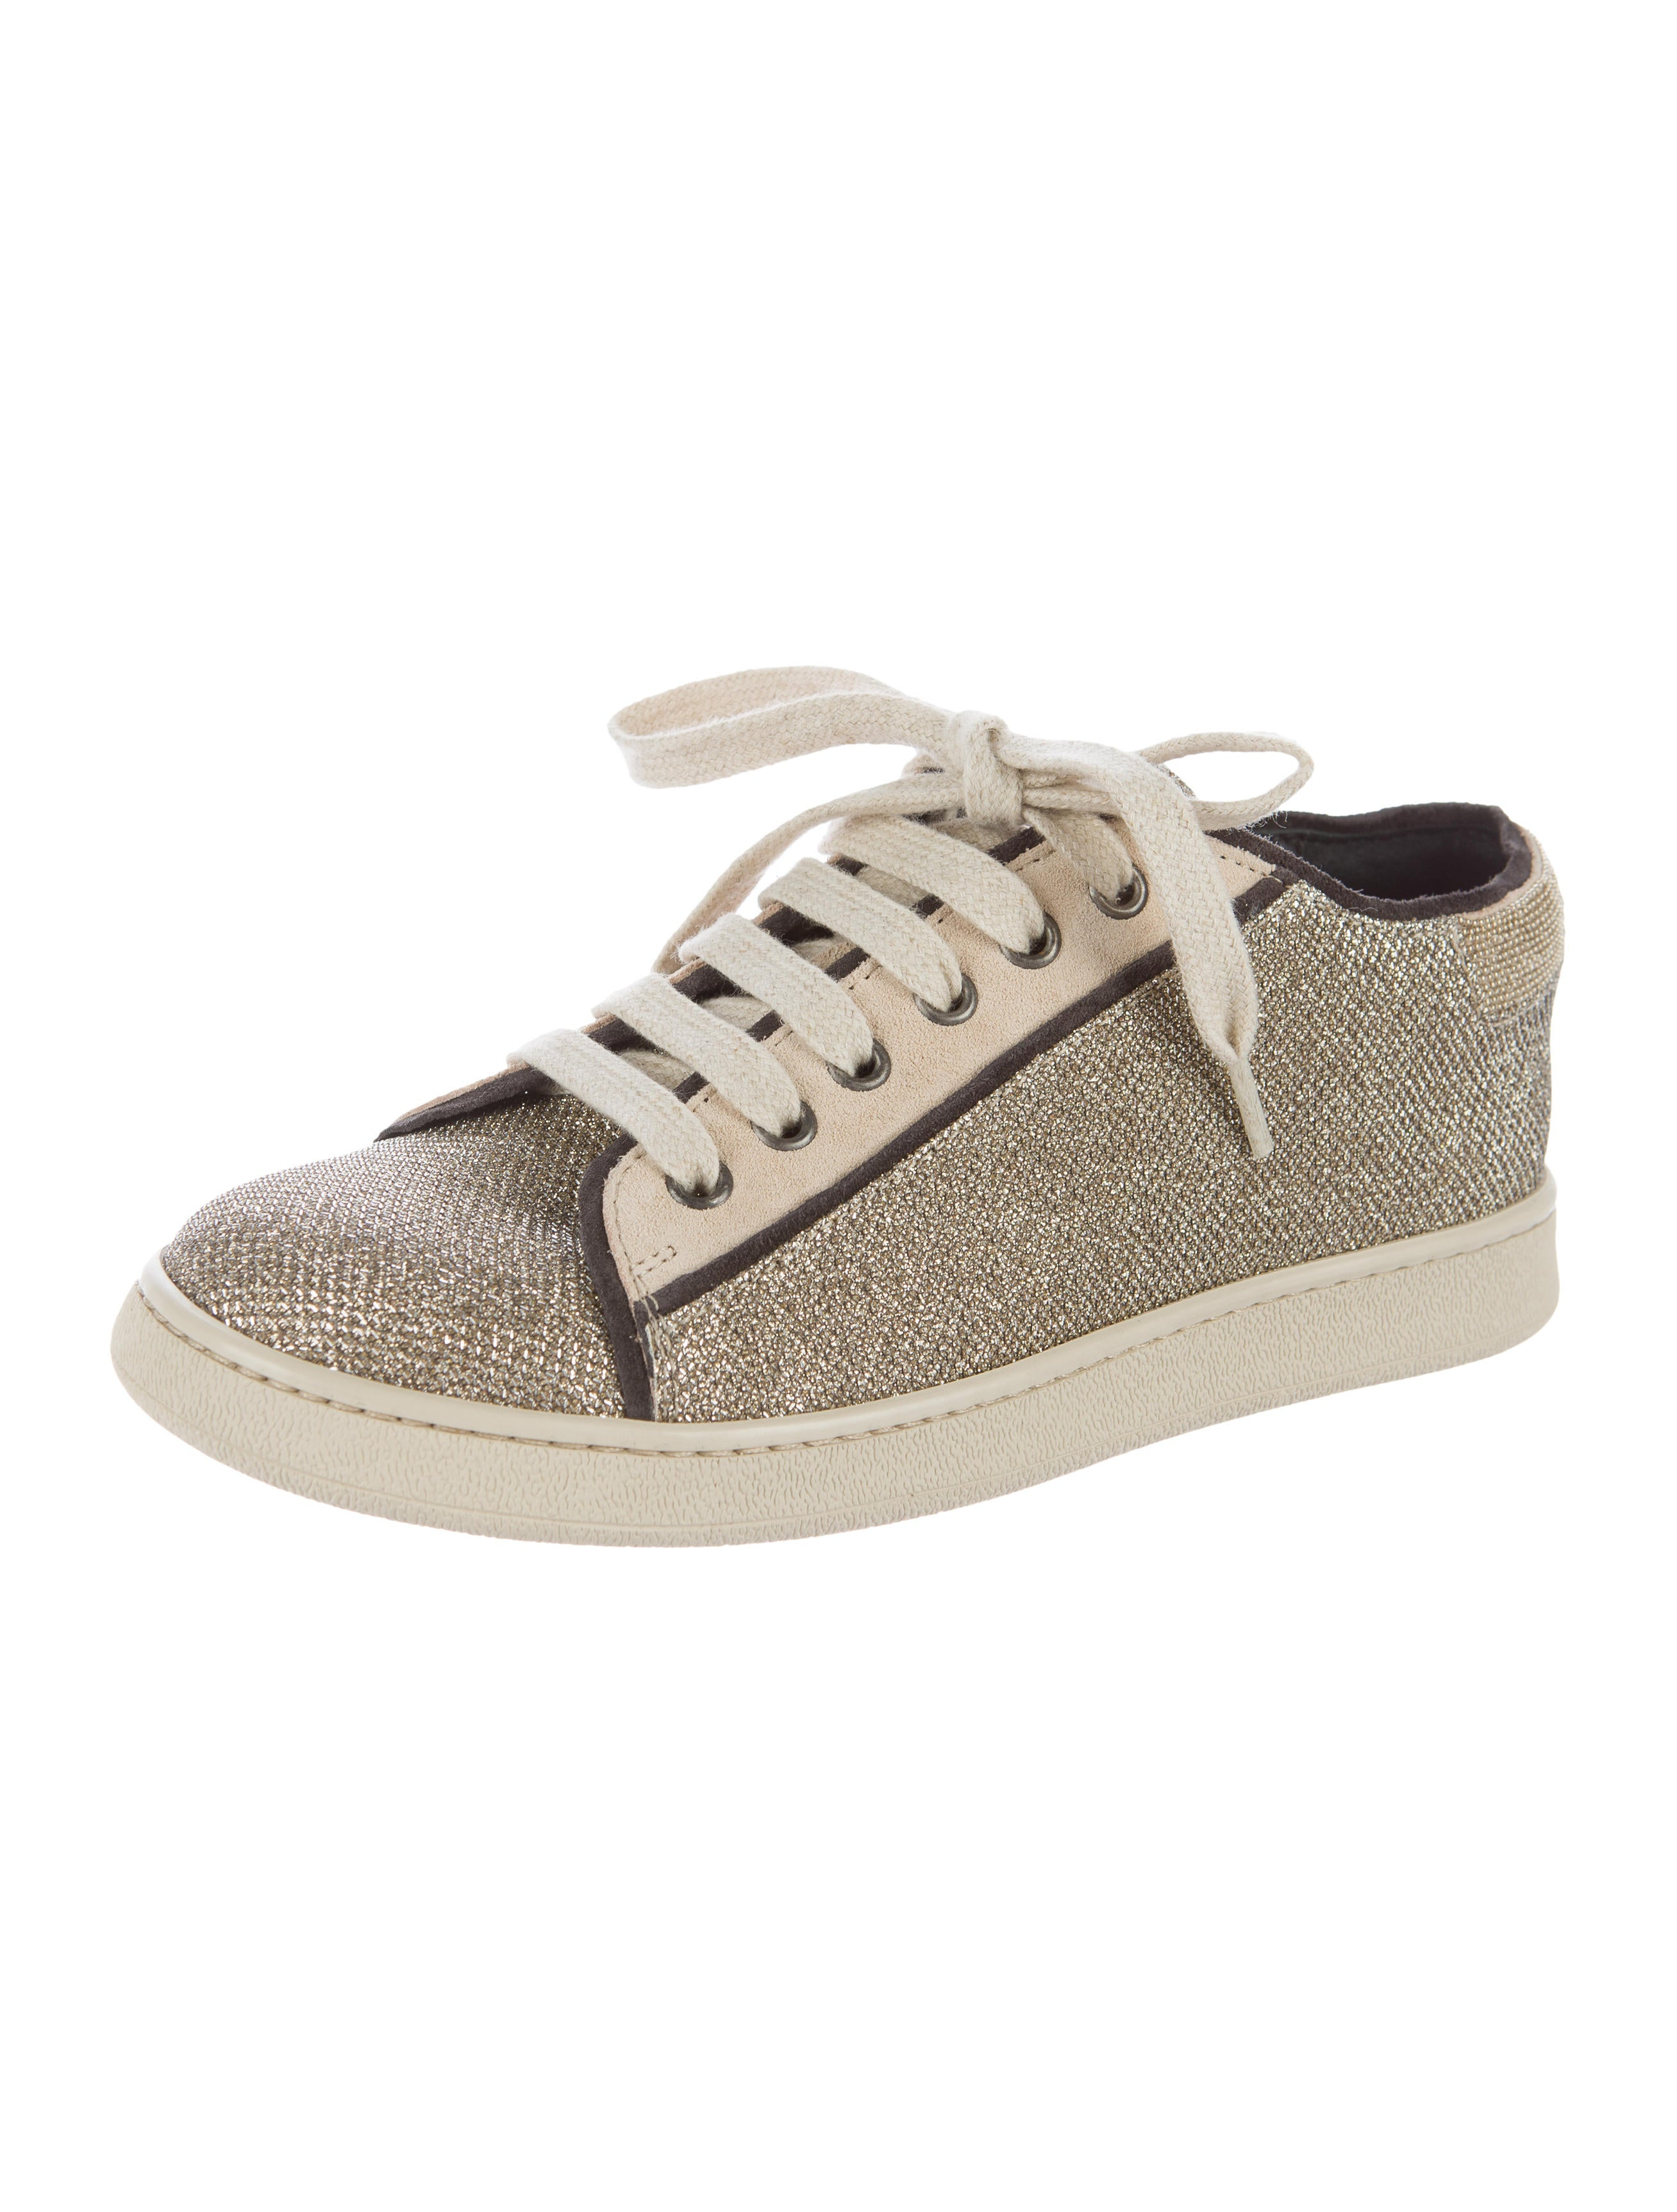 Brunello Cucinelli Monili-Trimmed Glitter Sneakers discount 2014 unisex ESxR3fy